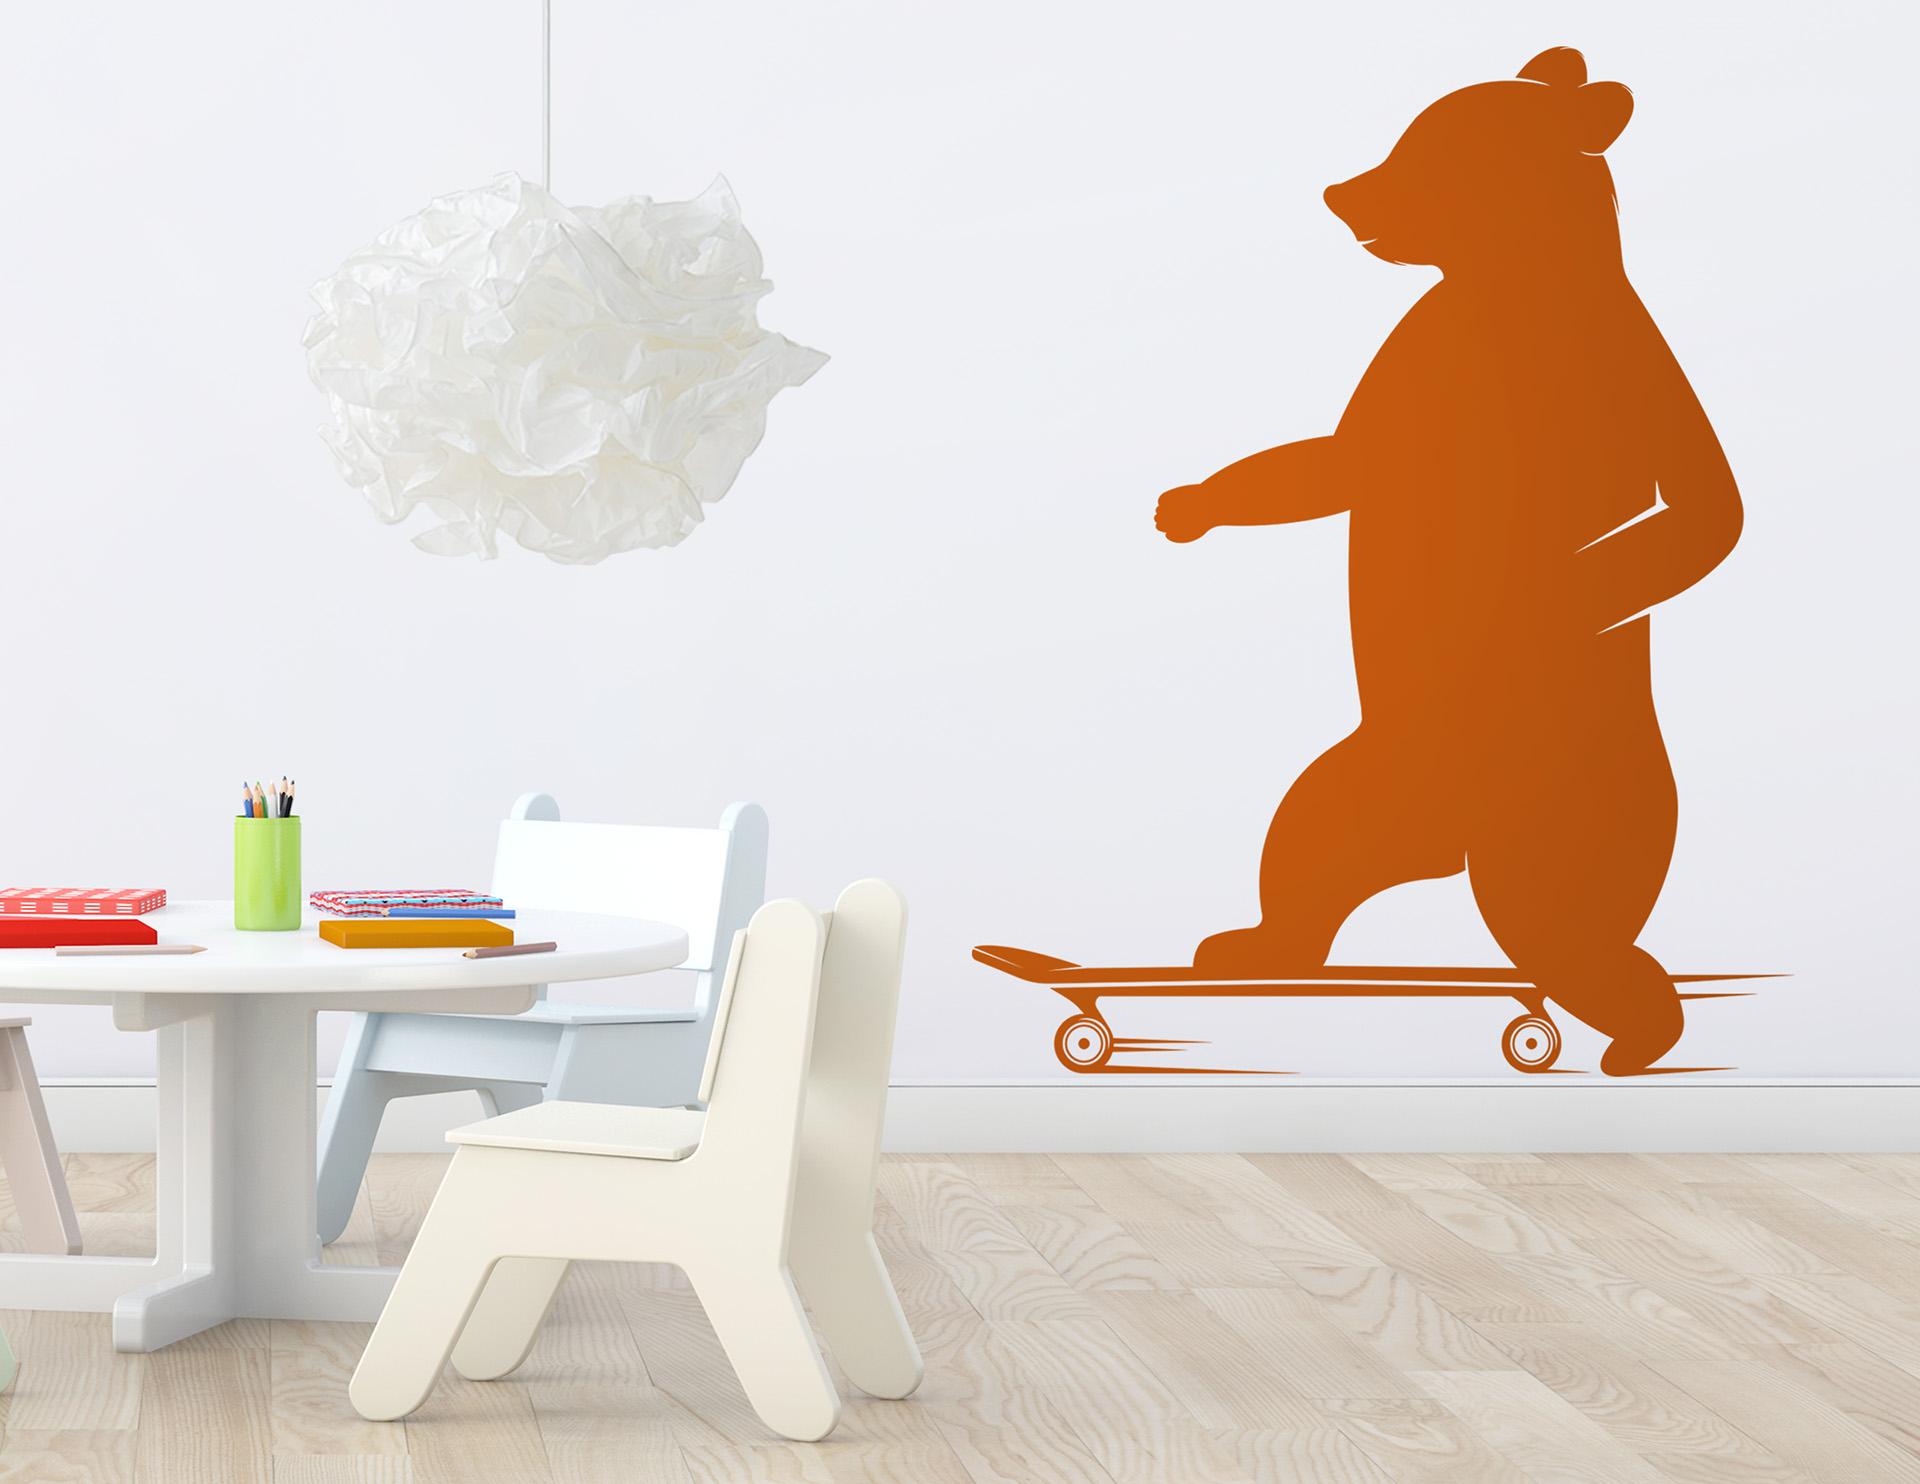 wandtattoo skateboard b r snazzy bringt spa in r ume. Black Bedroom Furniture Sets. Home Design Ideas